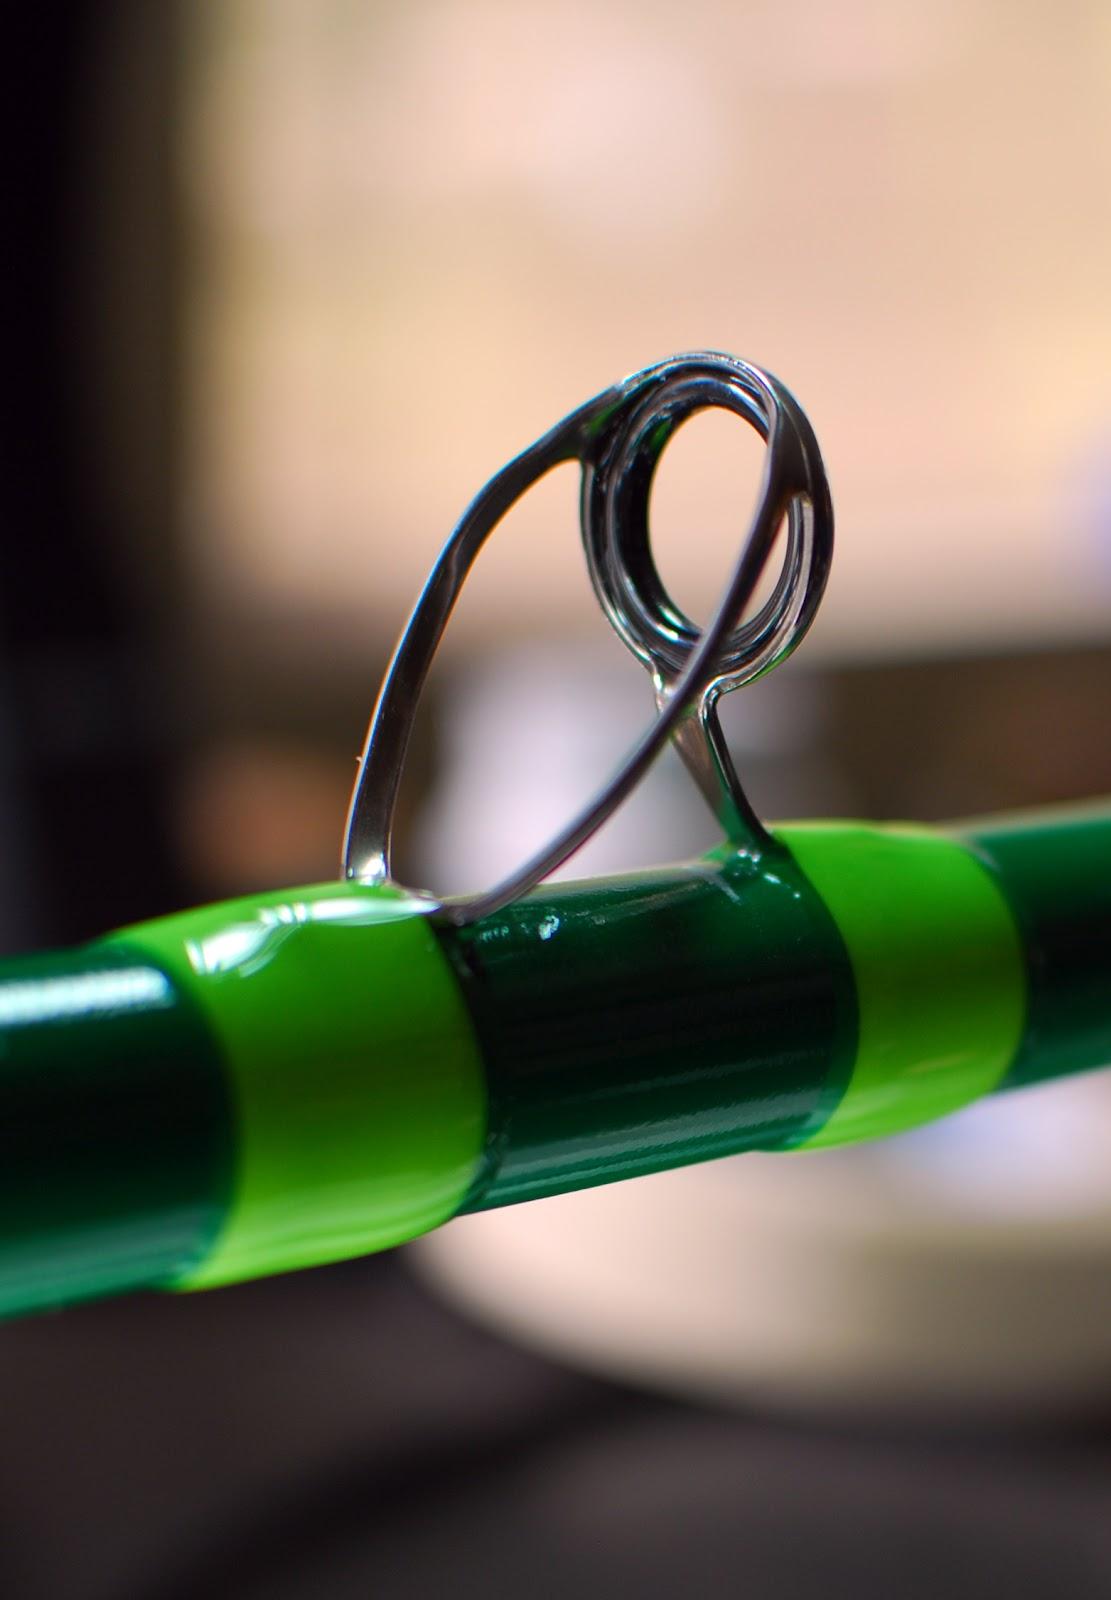 The green nitro heavy stiff for Nitro fishing rods